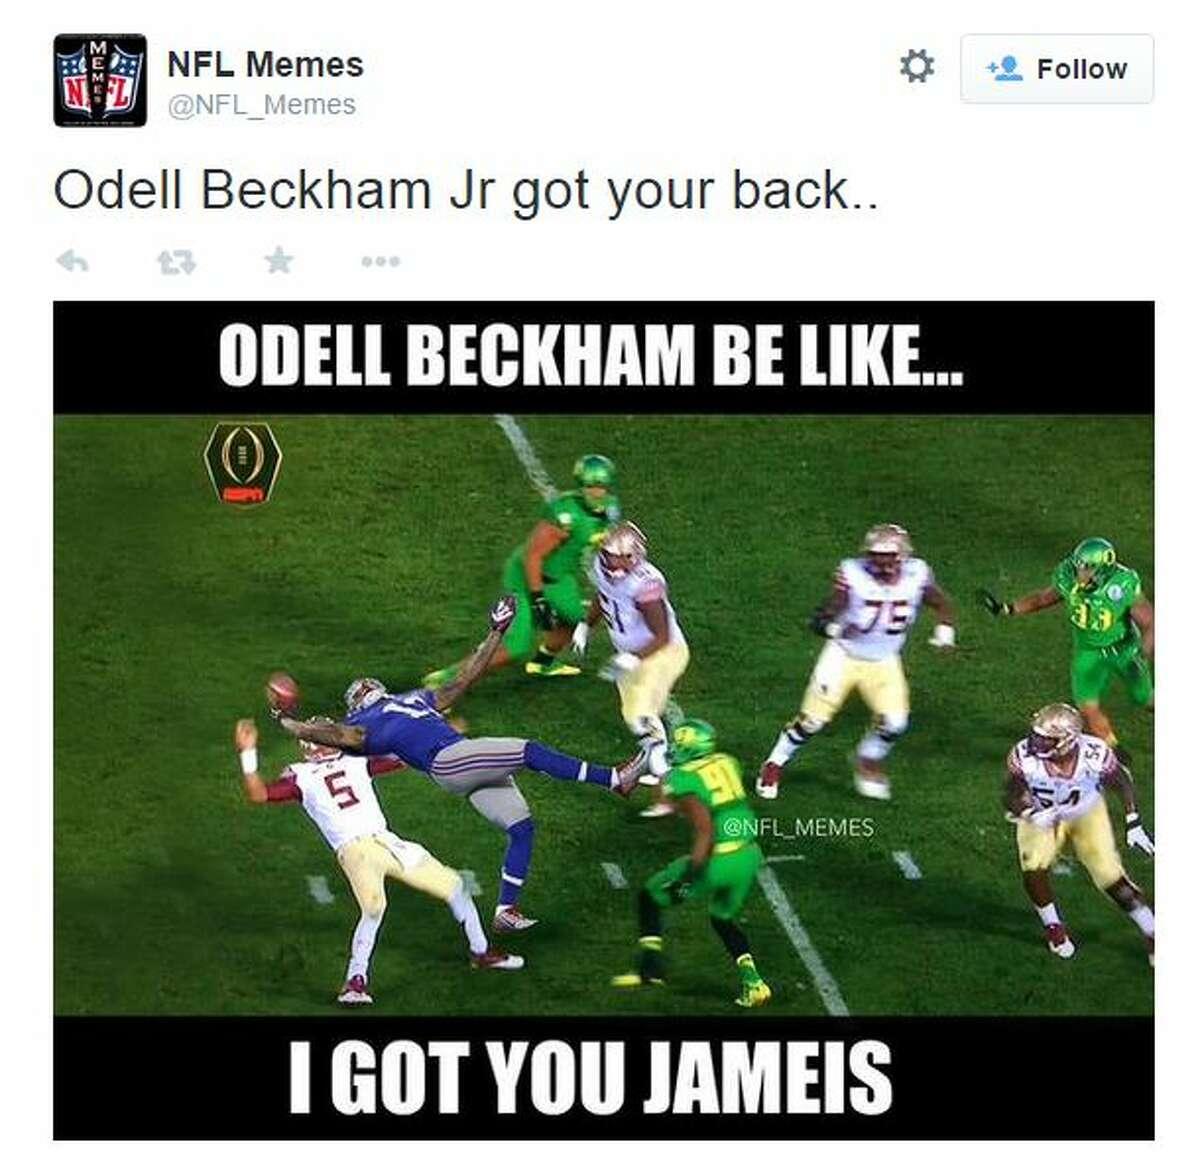 @NFL_Memes